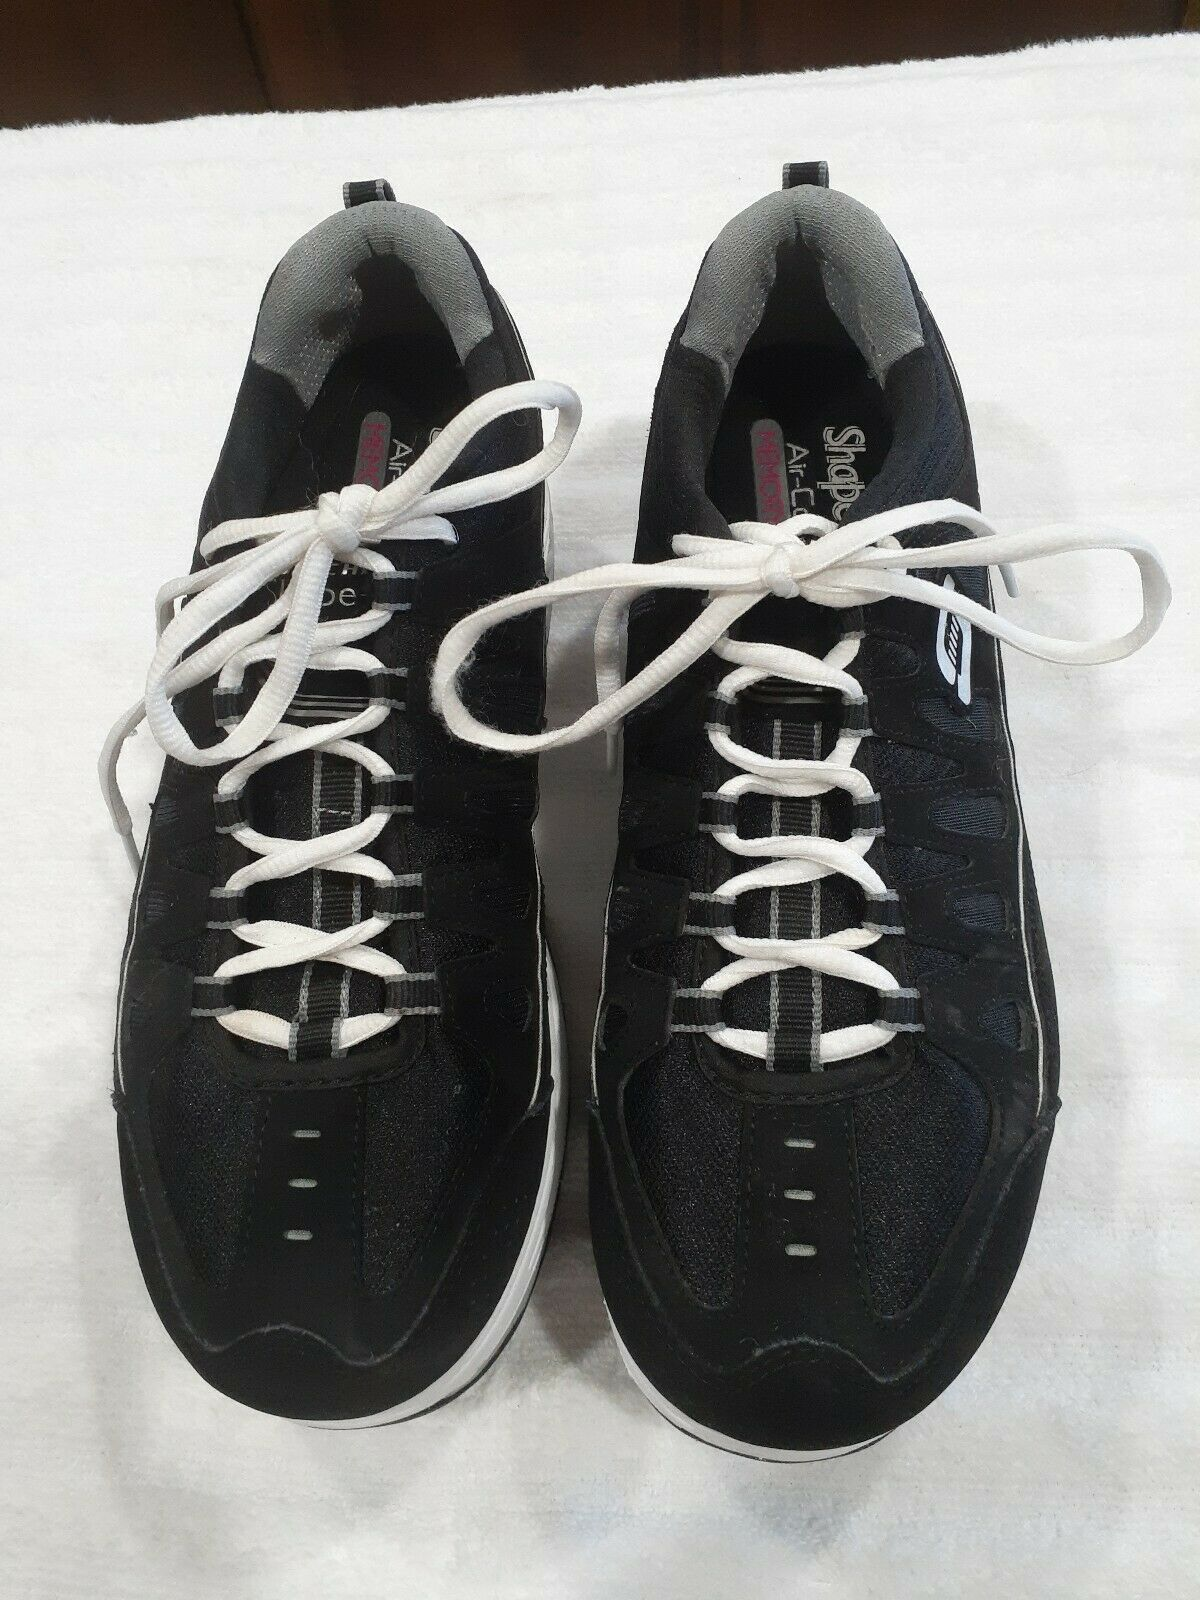 Womens Sz 9.5 M Skechers Shape-Ups Comfort Stride Shoes Sneakers Black & Silver